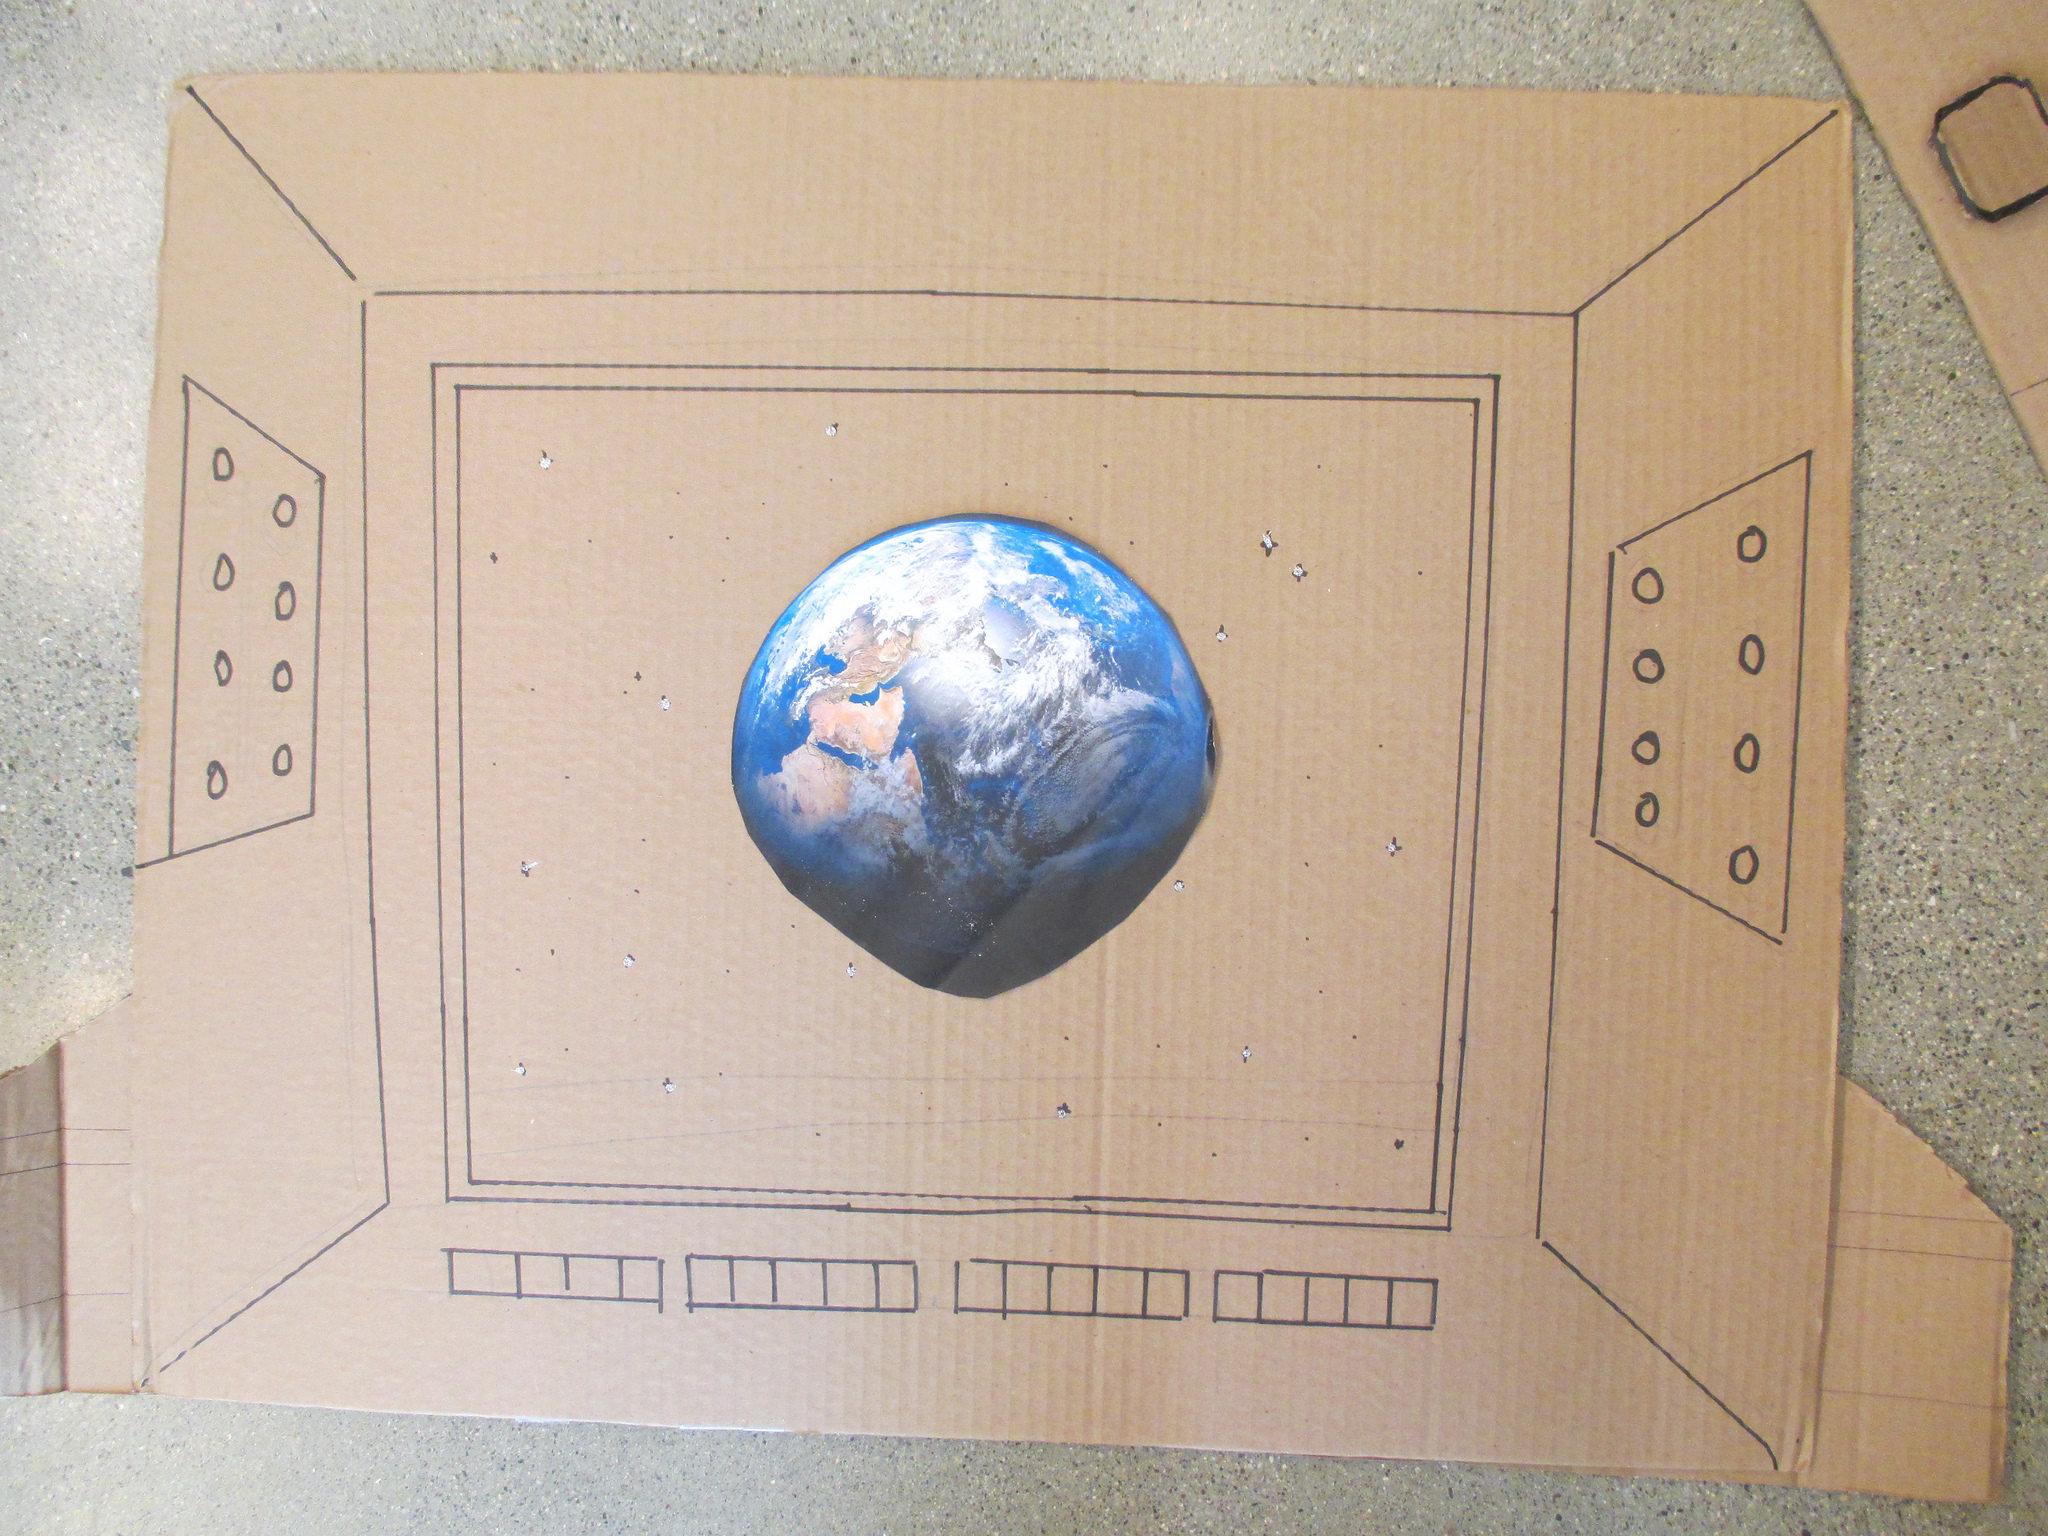 Spaceteam viewscreen